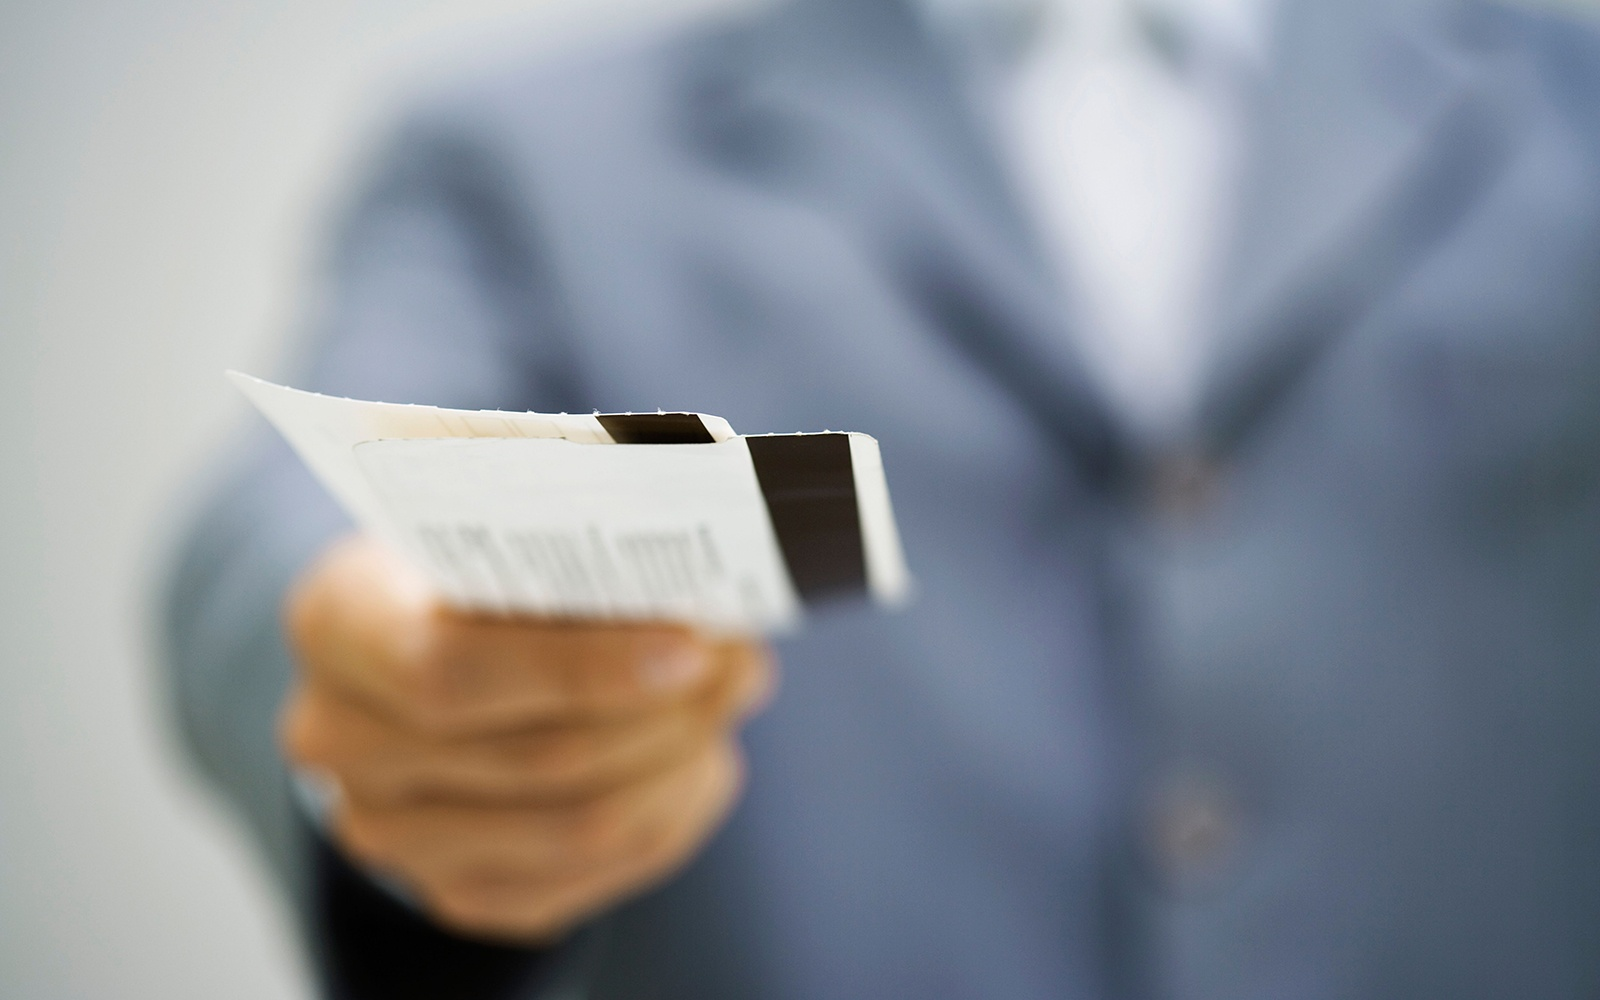 ARC: US travel agencies airline ticket sales decline 86% in March